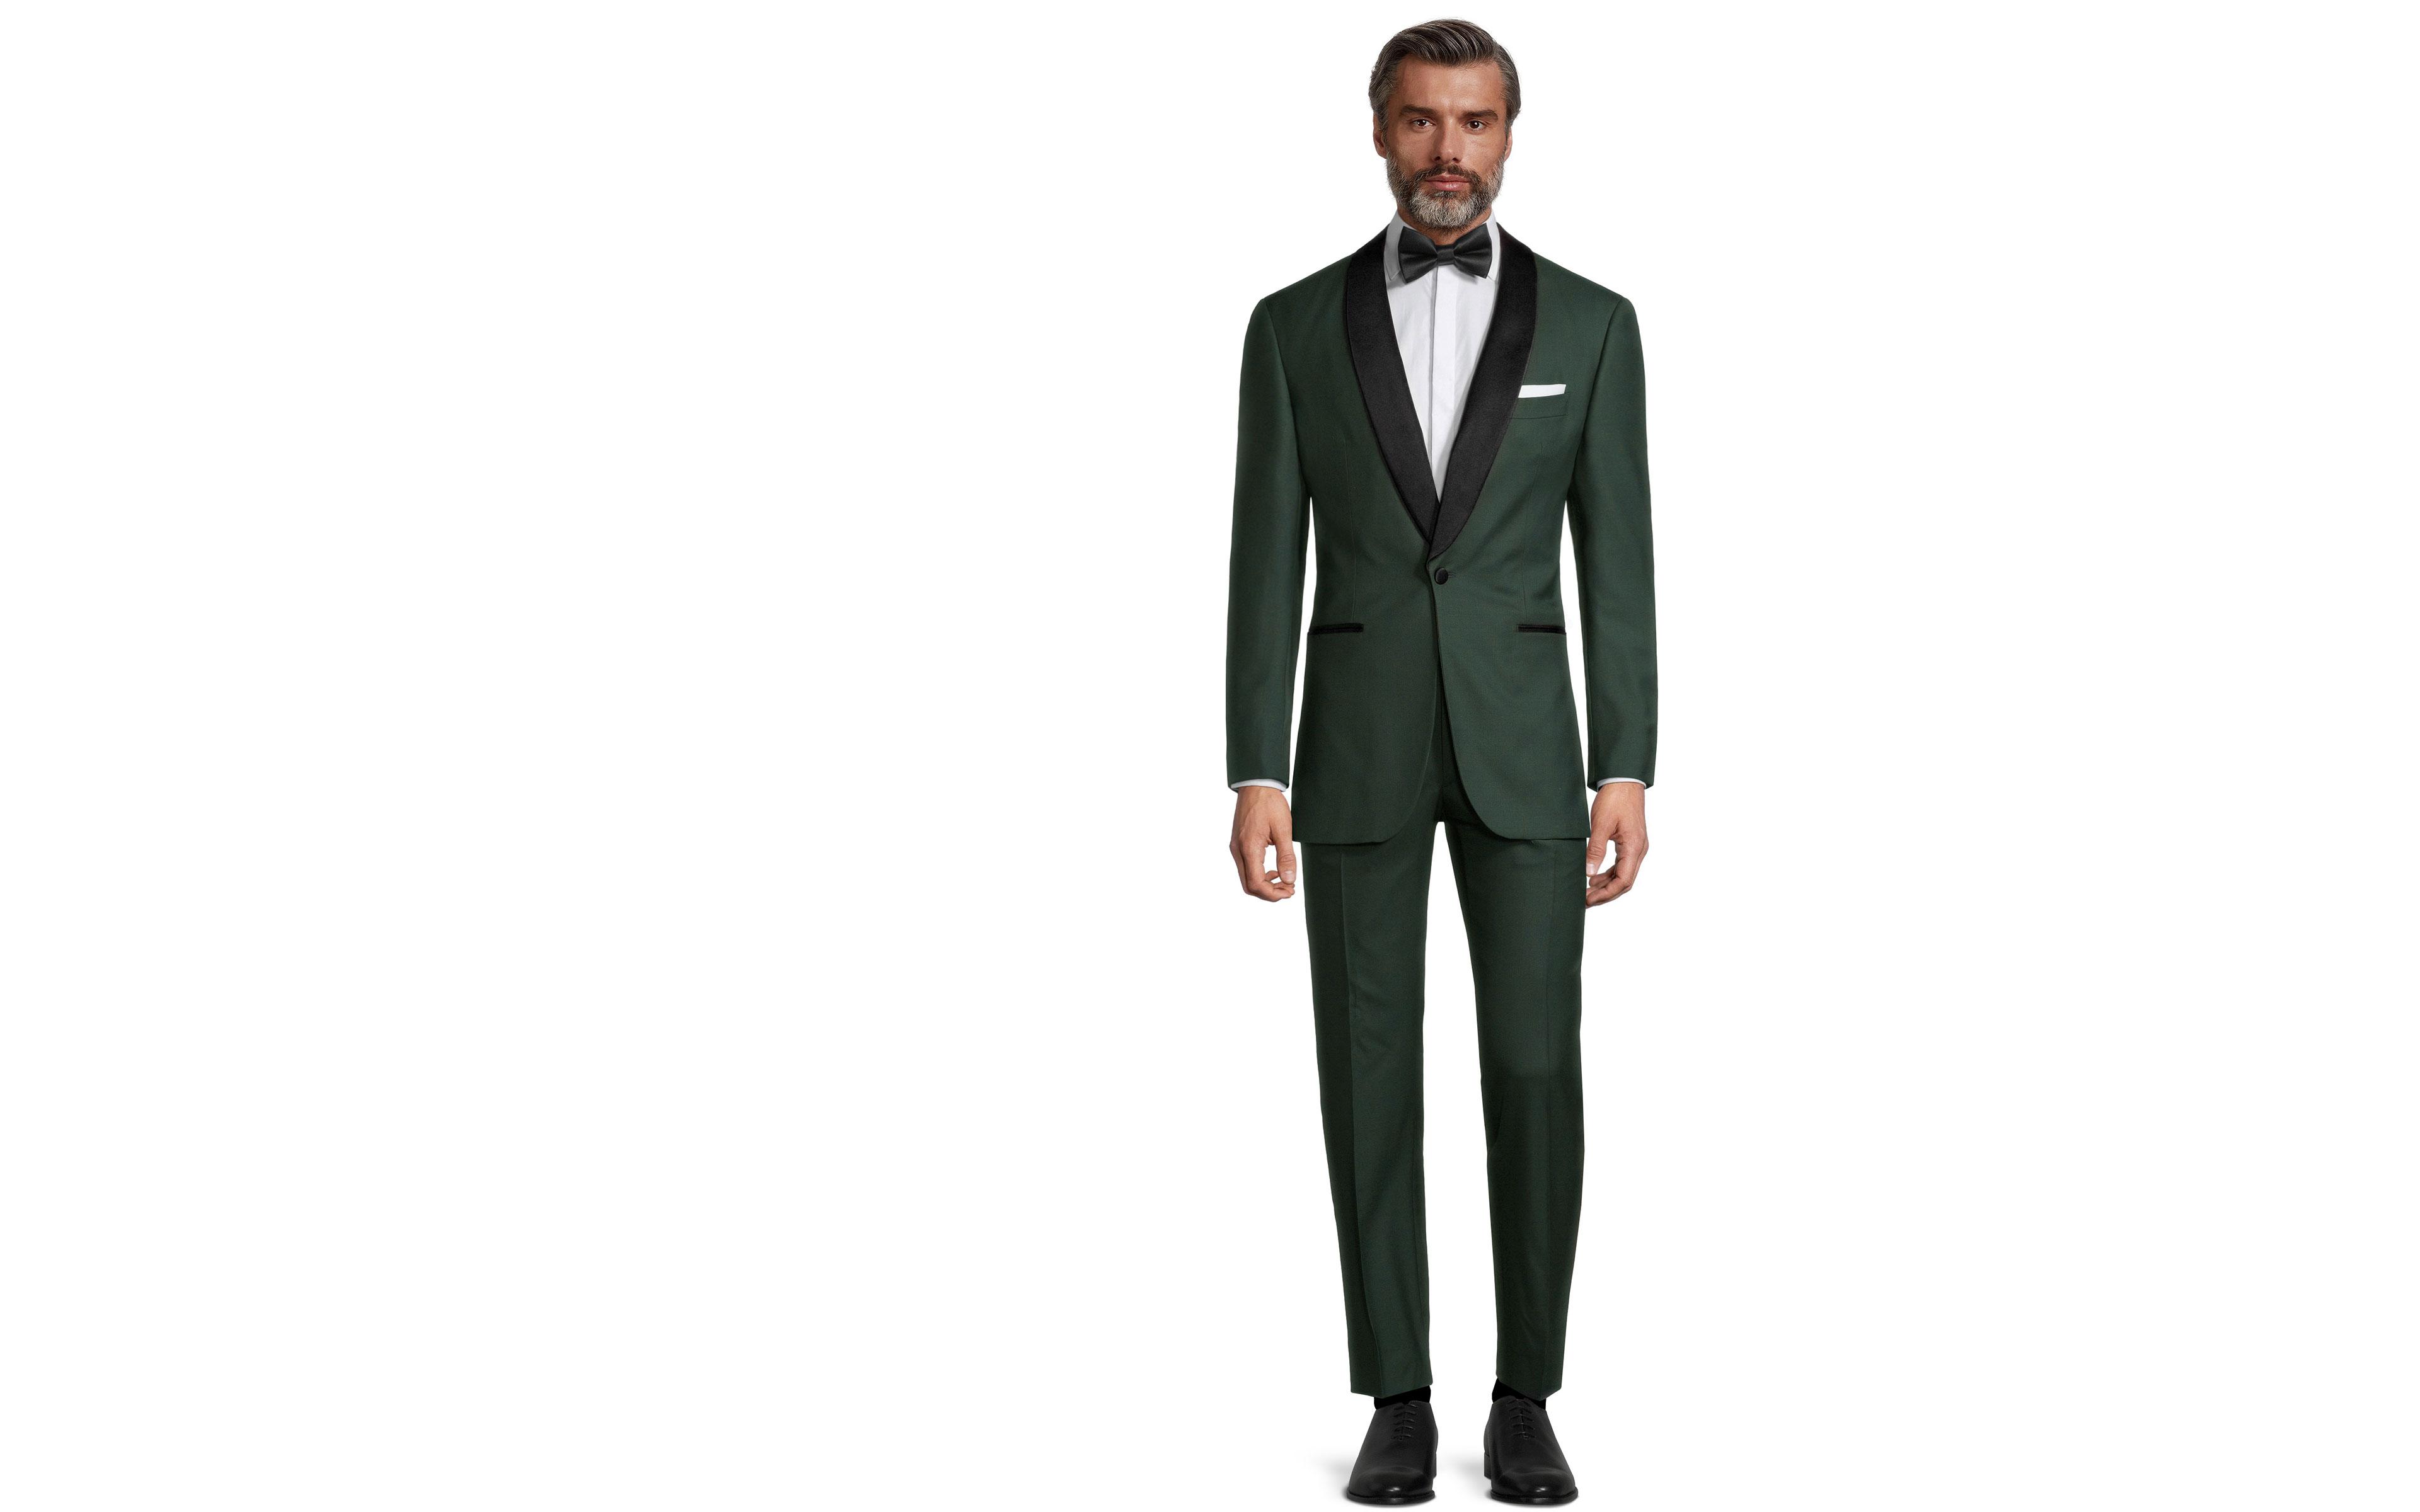 Vendetta Premium Solid Dark Green Tuxedo